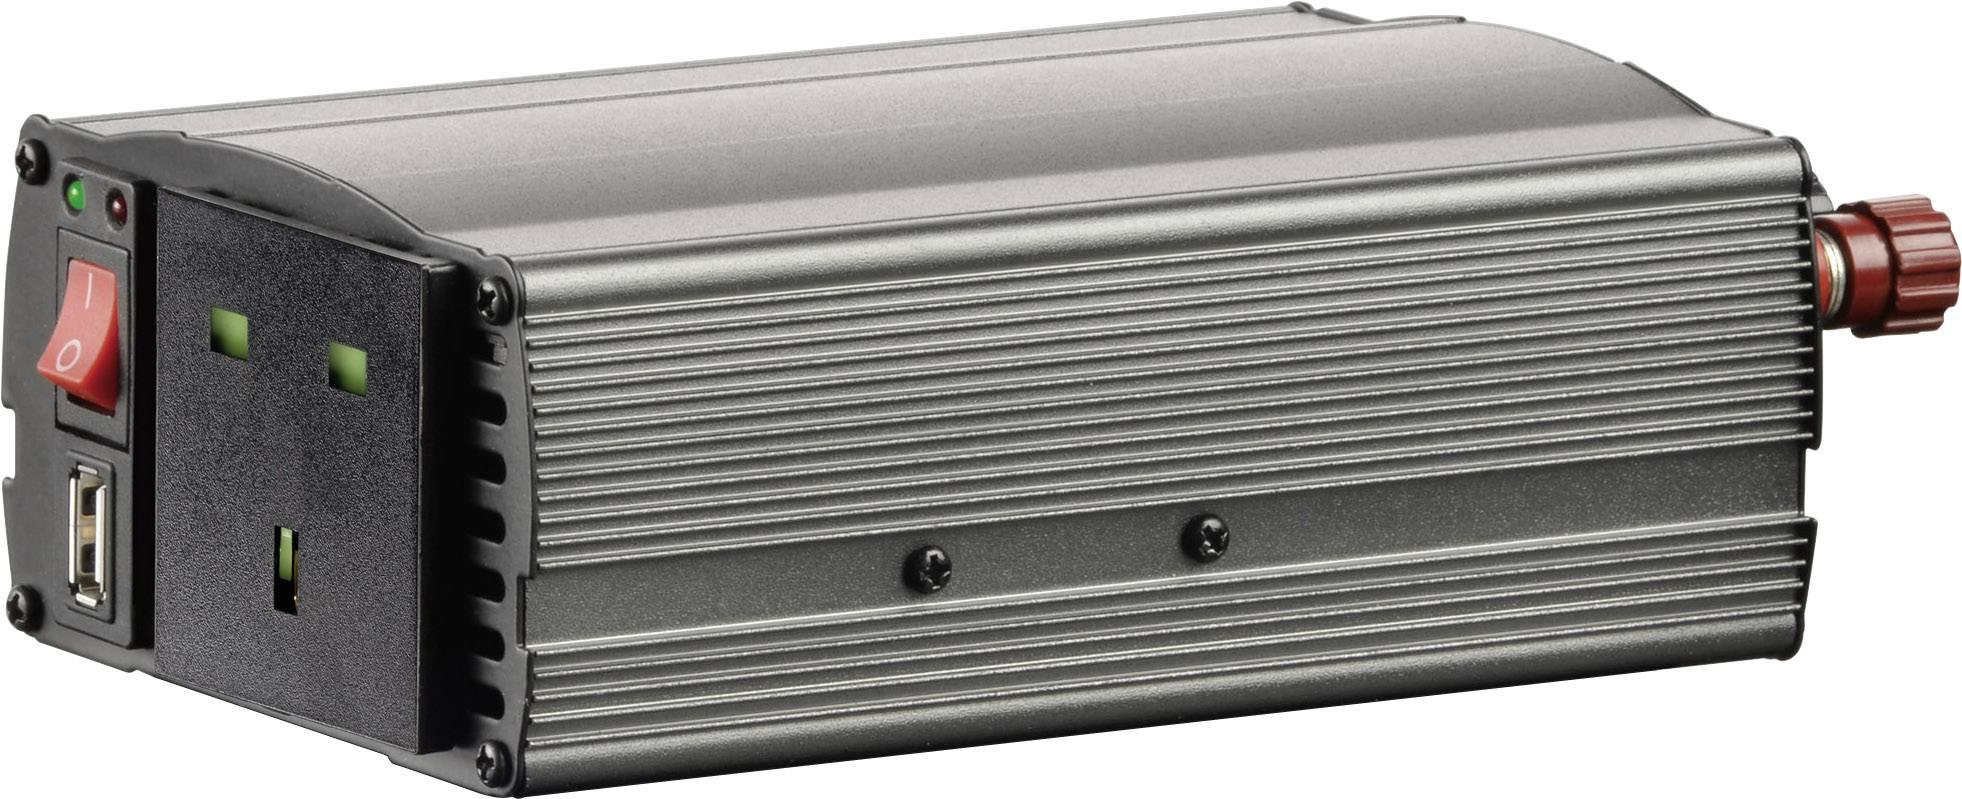 Konvertor VOLTCRAFT MSW 300-12-UK, 300 W, 12 V/DC/230 V/AC, 300 W